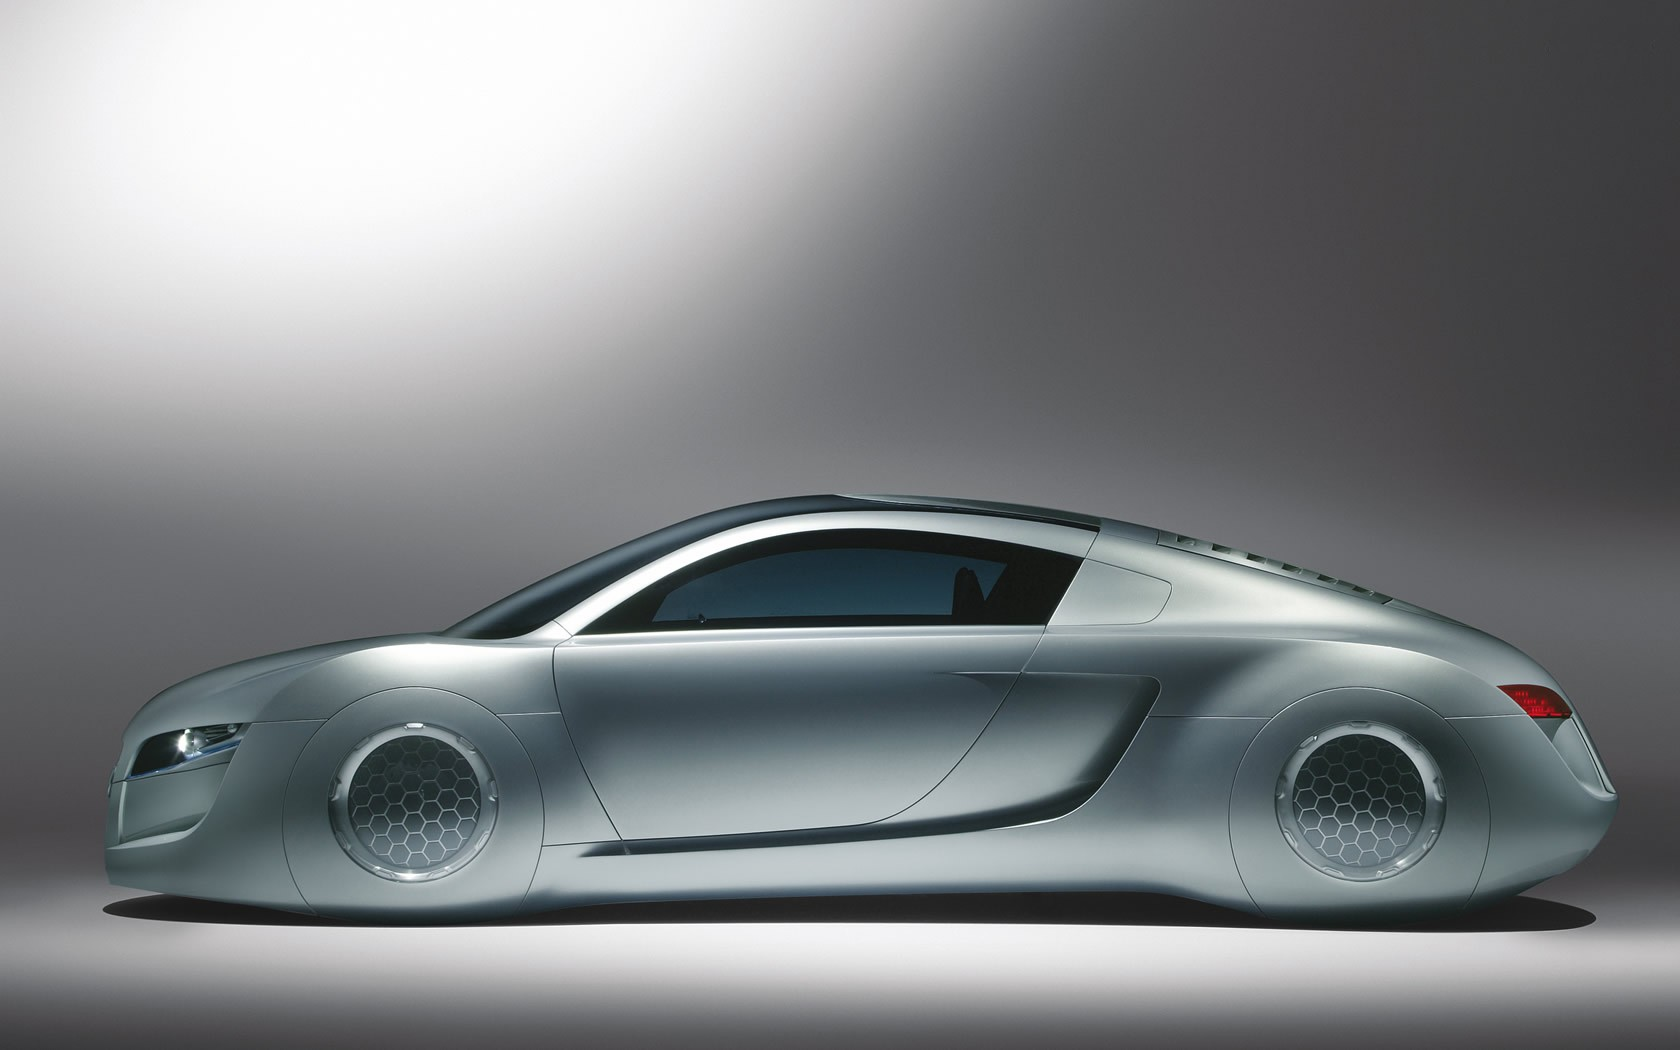 futuristic-cars_00258189.jpg